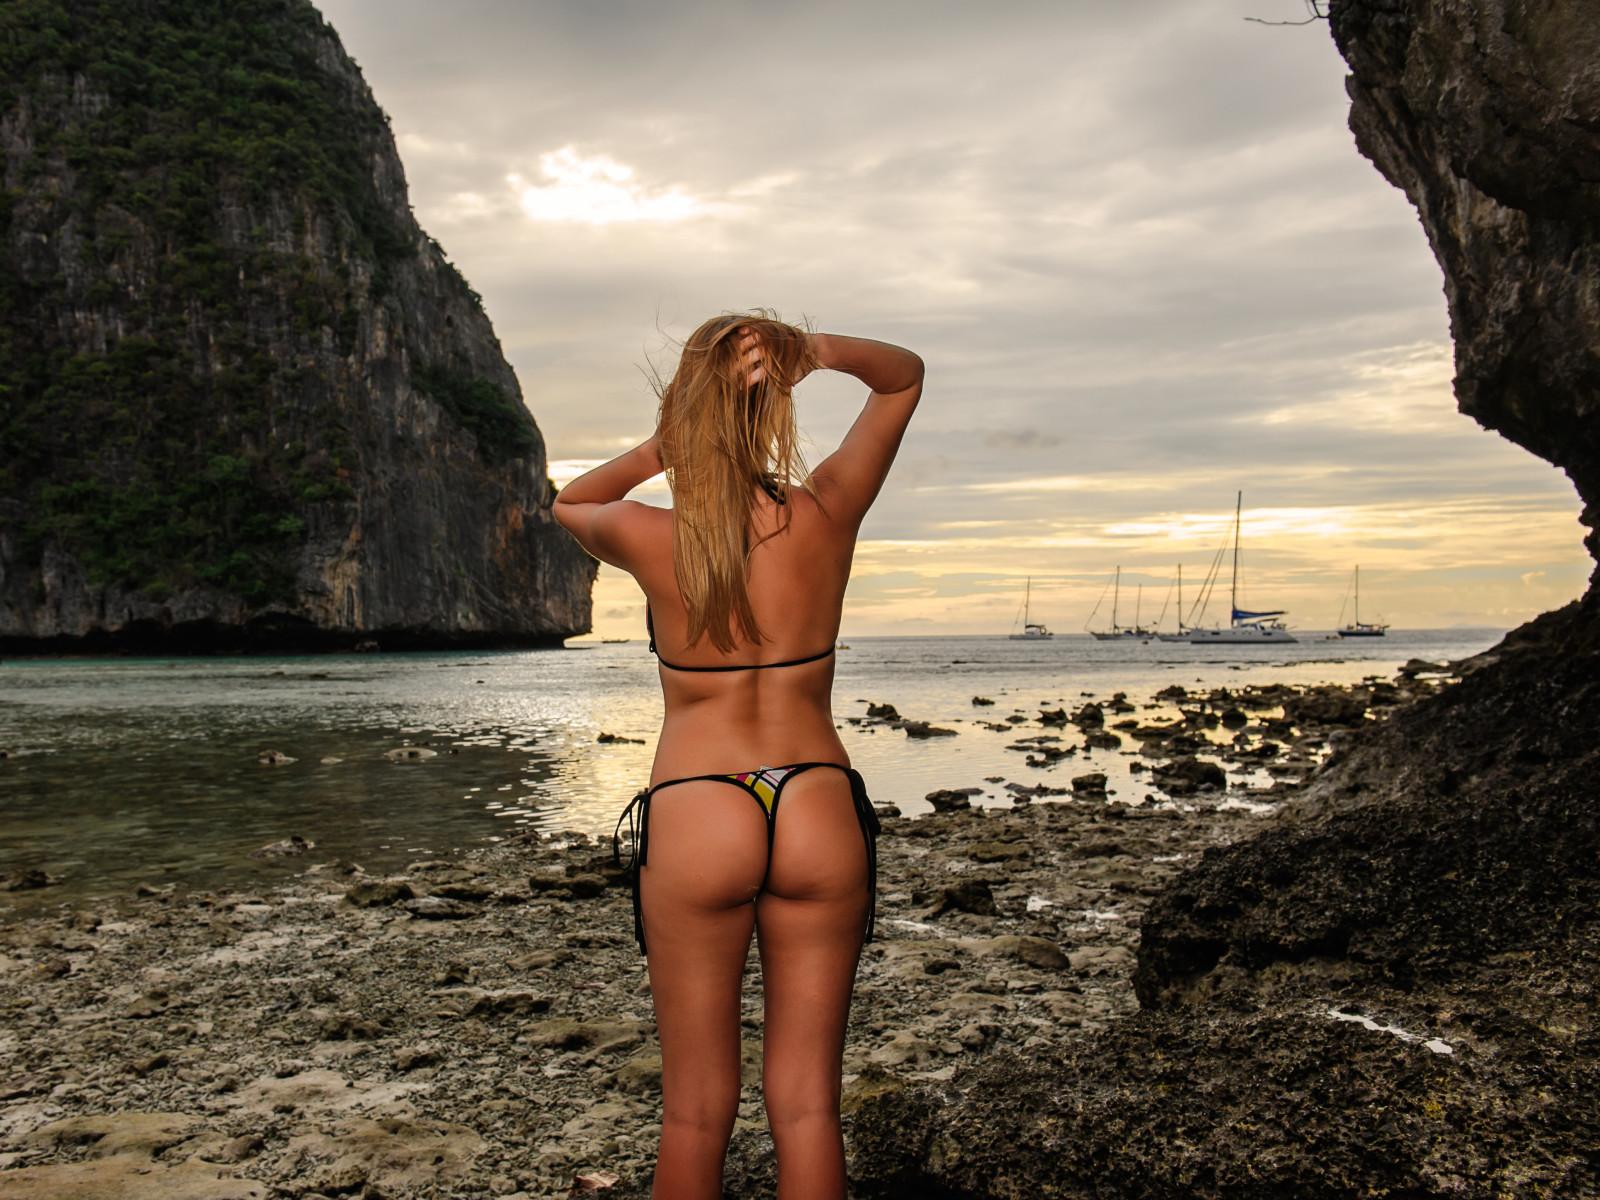 brit ekland nude